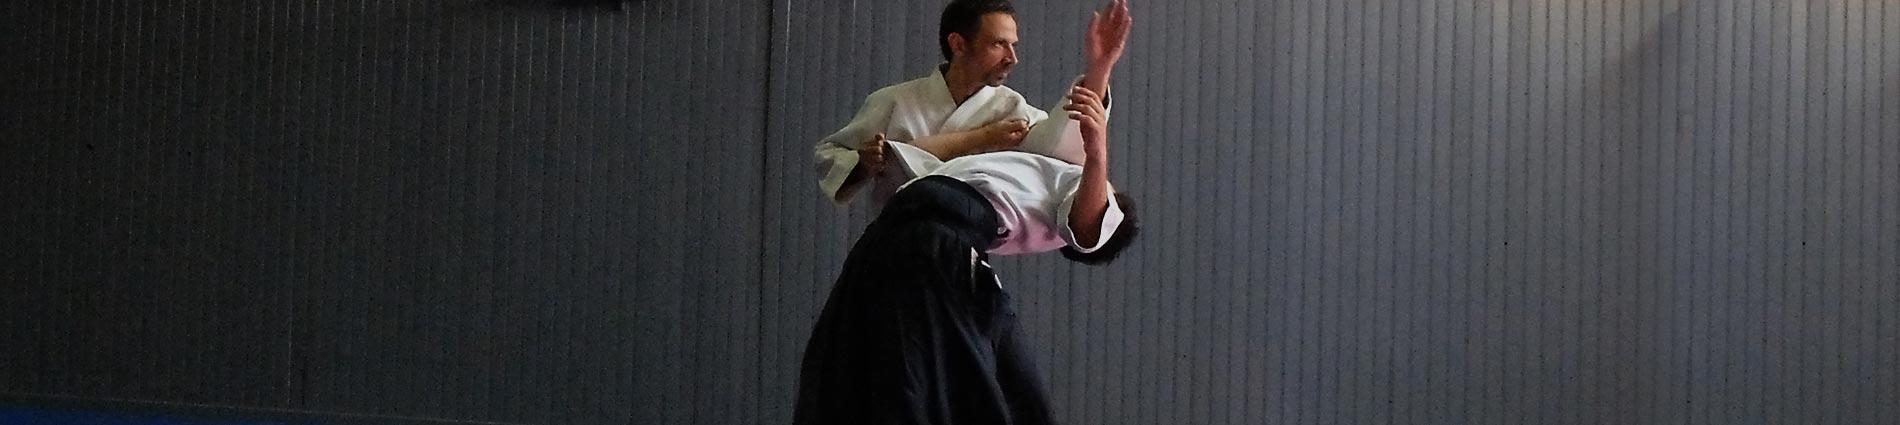 aikido été 2016